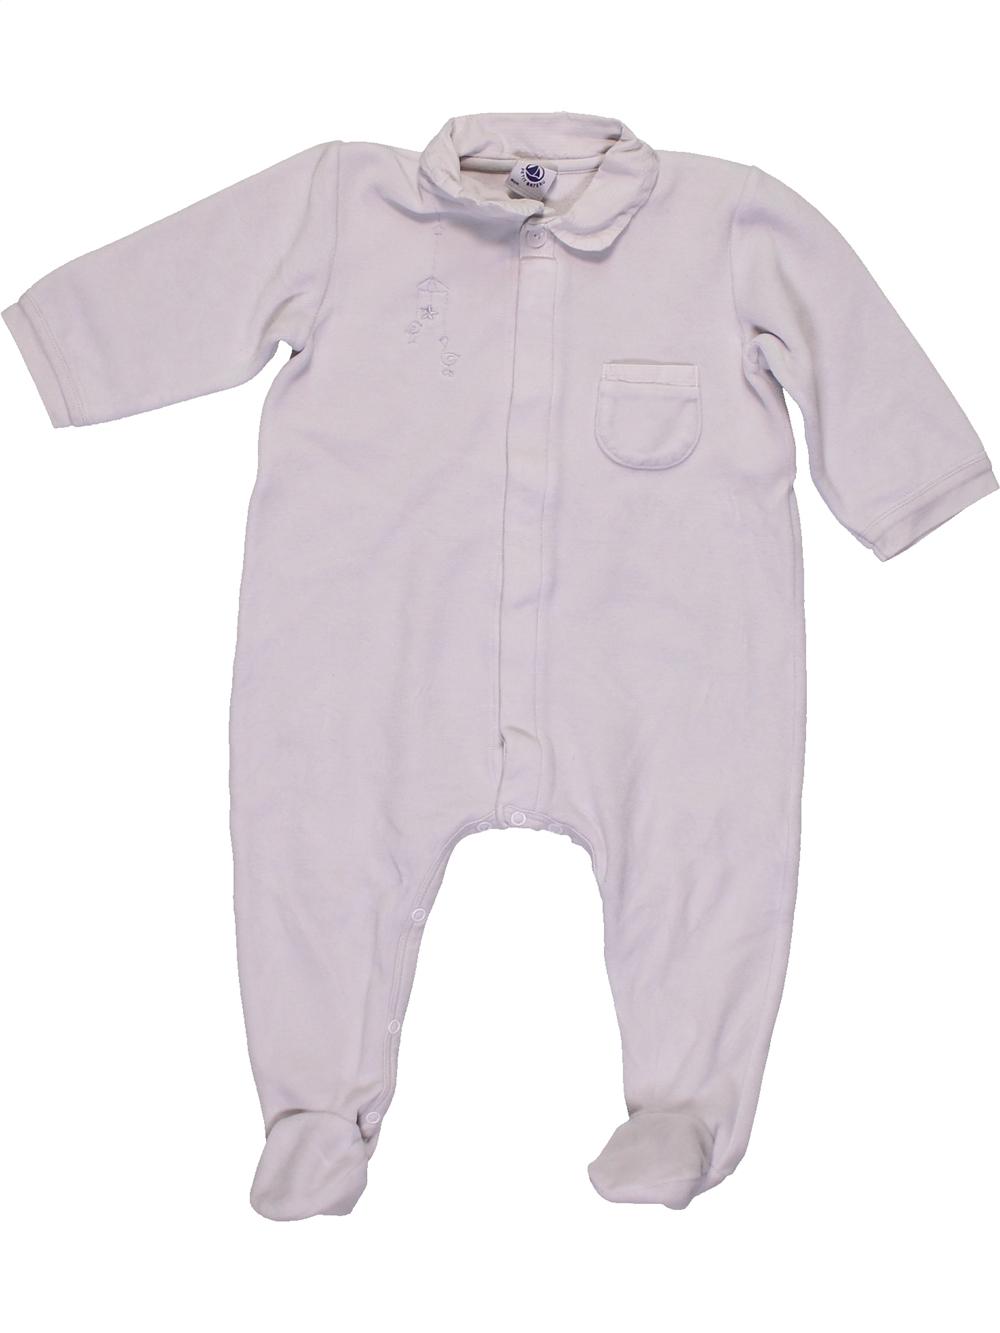 Pyjama-1-piece-bebe-unisexe-PETIT-BATEAU-12-mois-blanc-hiver-vetement-beb